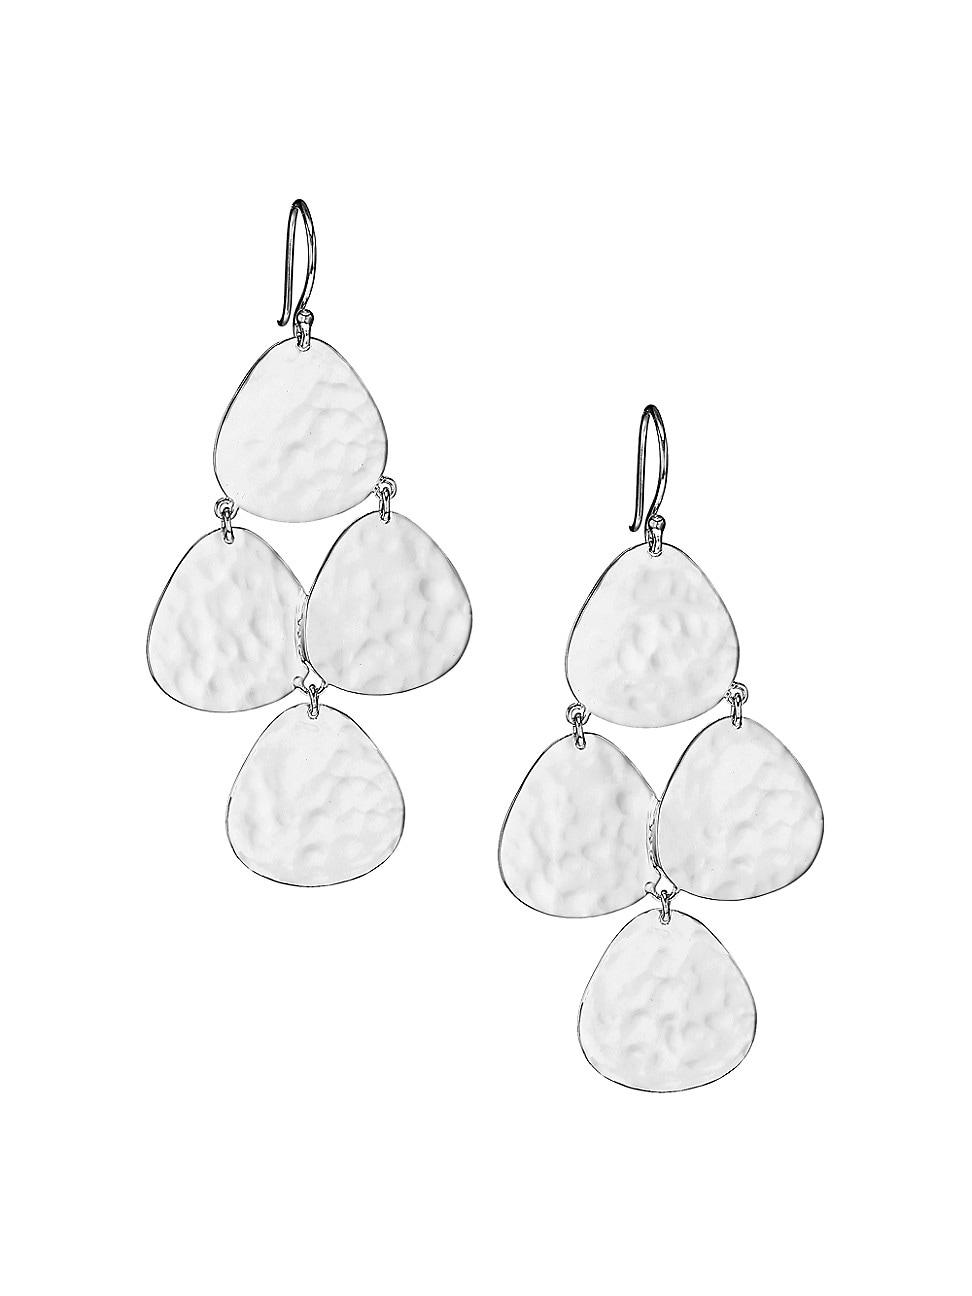 Ippolita Earrings WOMEN'S 925 CLASSICO CRINKLE SMALL NOMAD CASCADE EARRINGS